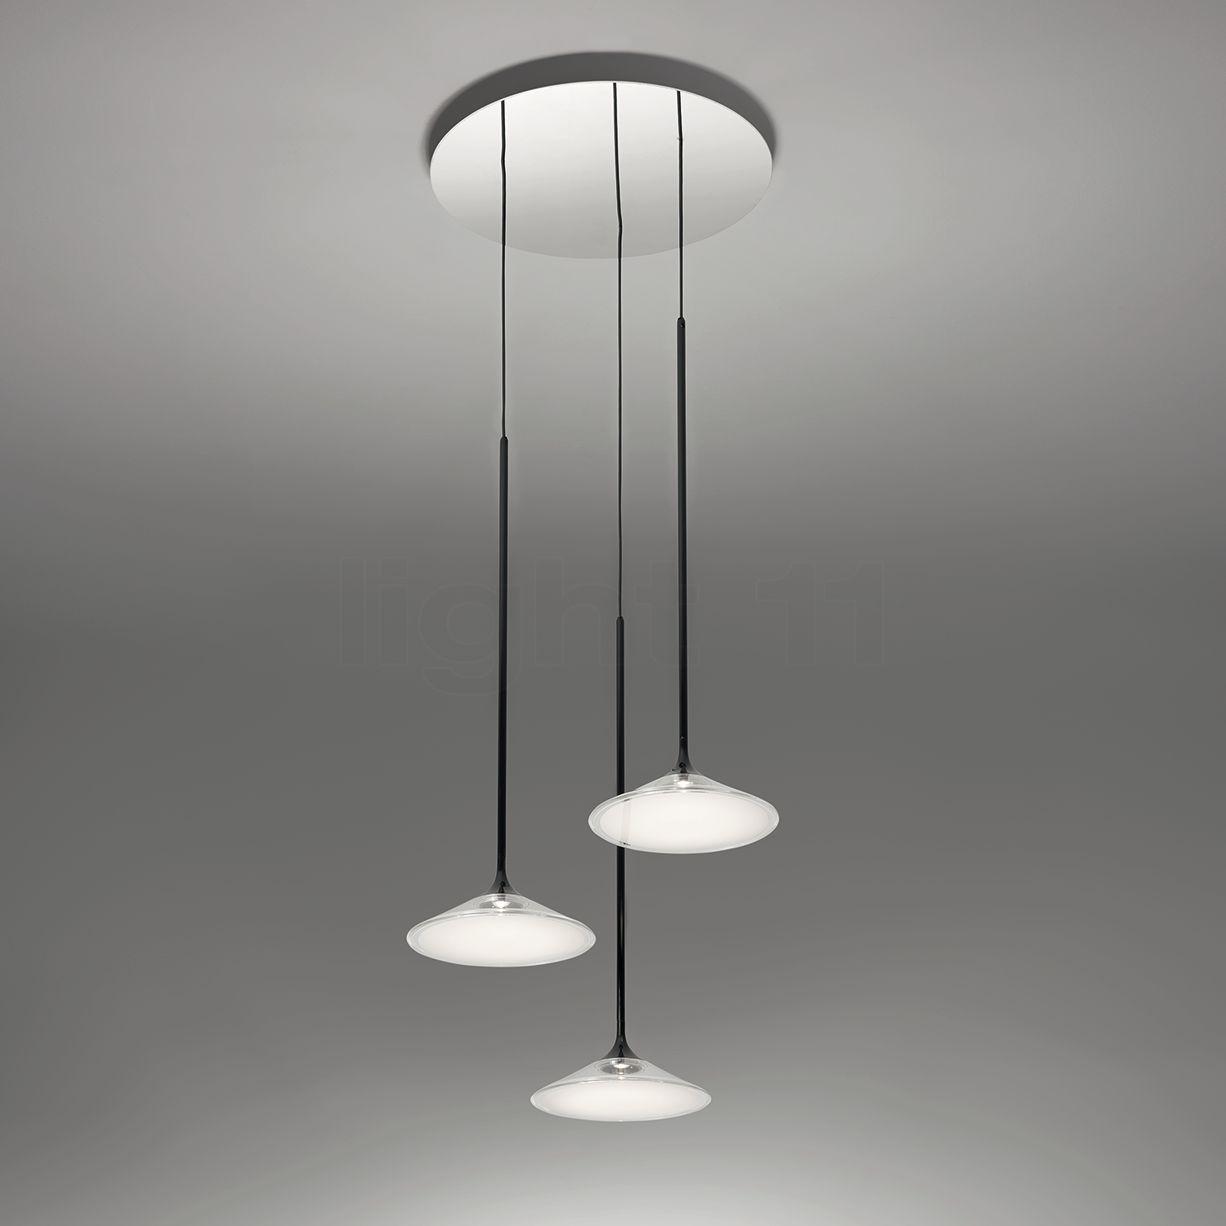 lampen artemide free pirce mini ceiling lamp by artemide. Black Bedroom Furniture Sets. Home Design Ideas